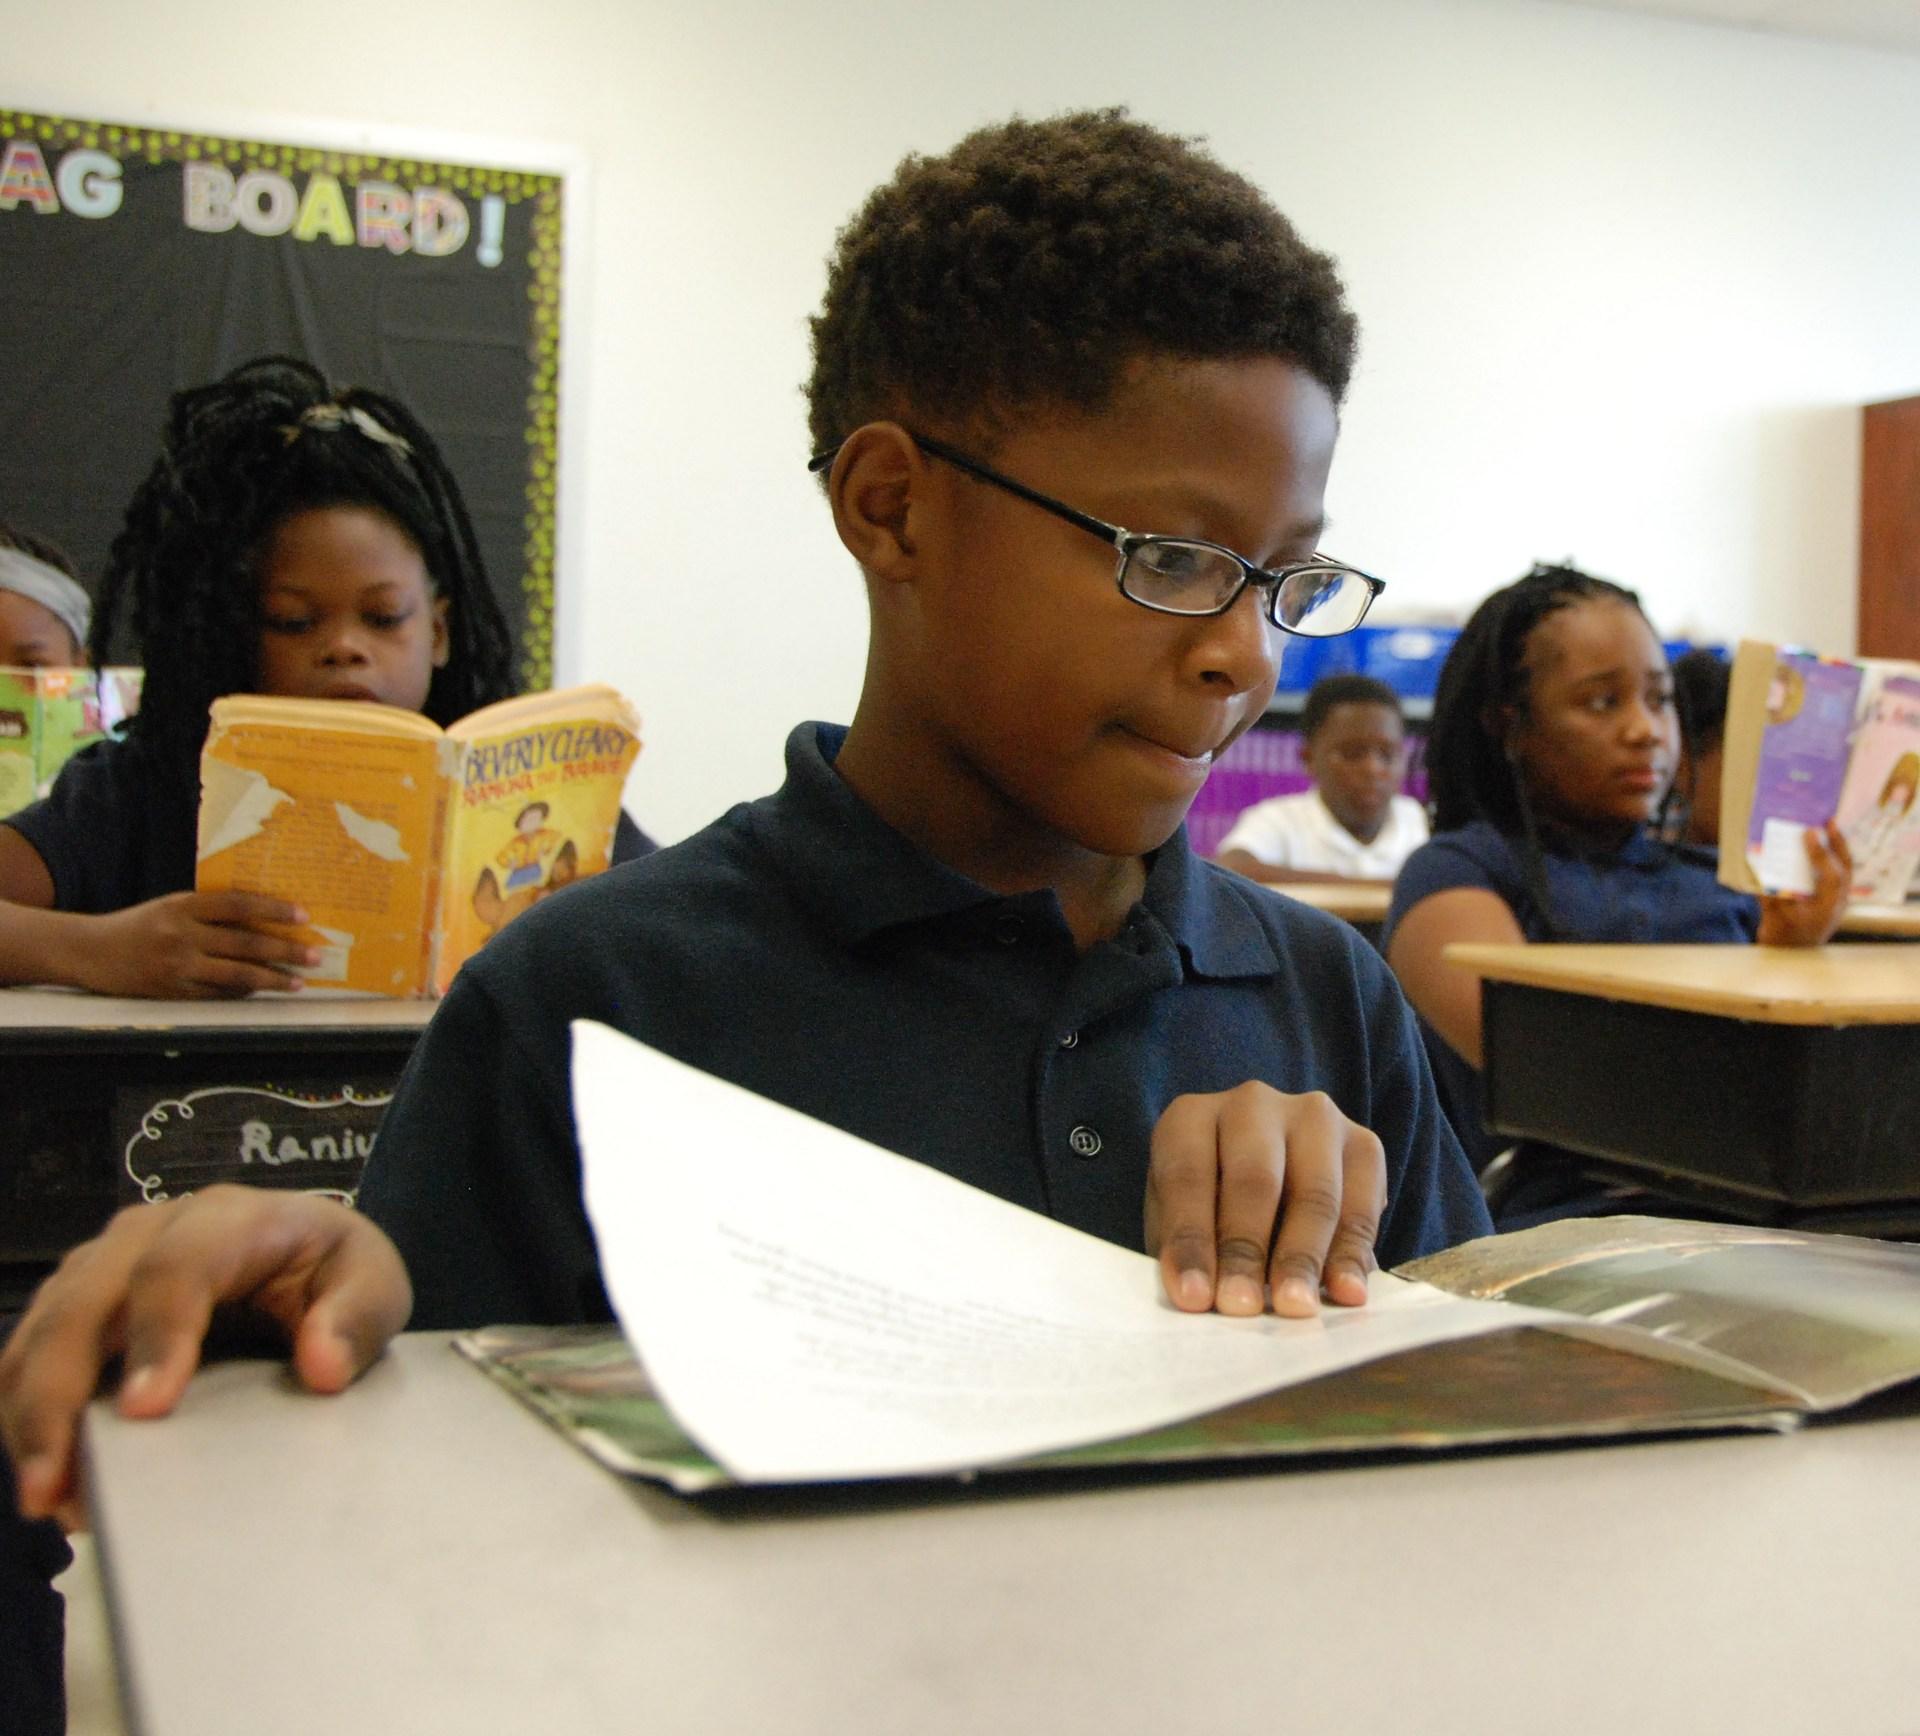 Boy reading at desk